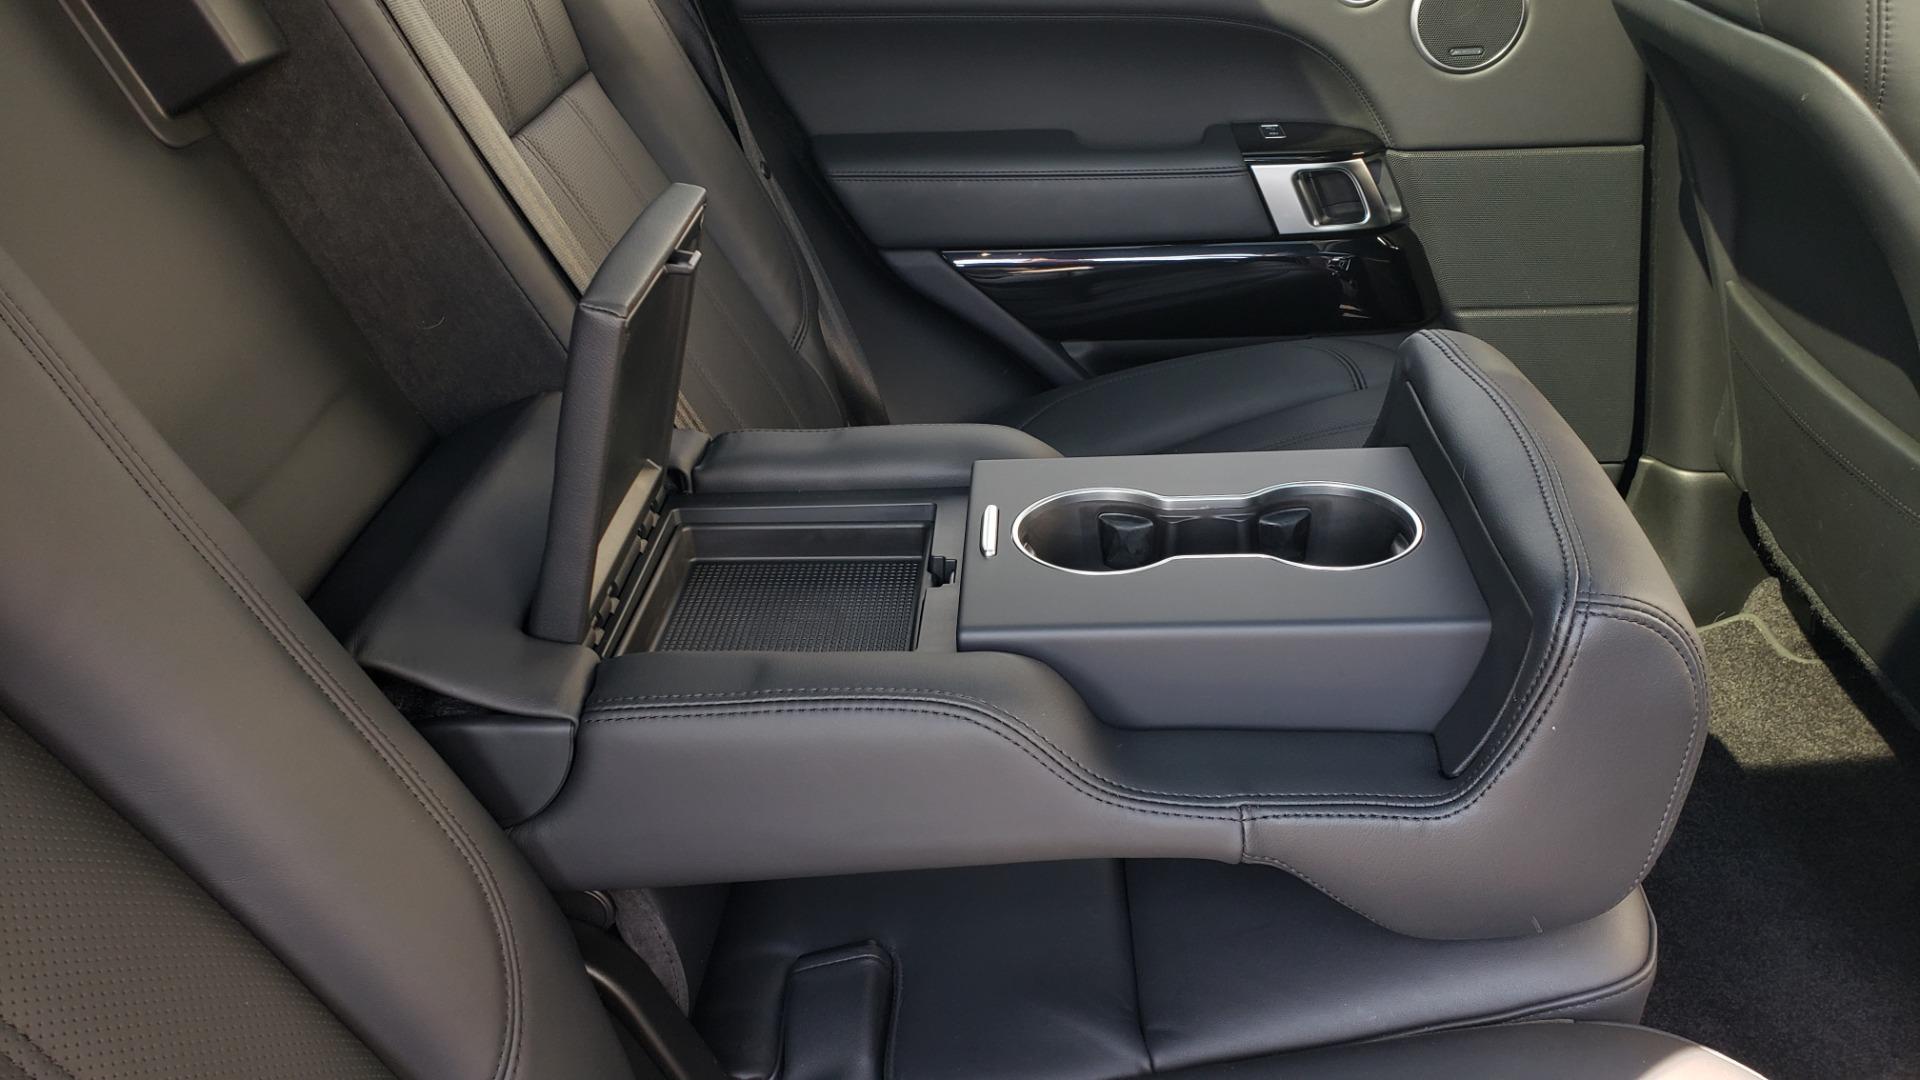 Used 2017 Land Rover RANGE ROVER SC V8 / VISION ASST / DRIVE PKG / MERIDIAN SOUND / PANO-ROOF / NAV / BSM for sale $75,995 at Formula Imports in Charlotte NC 28227 80